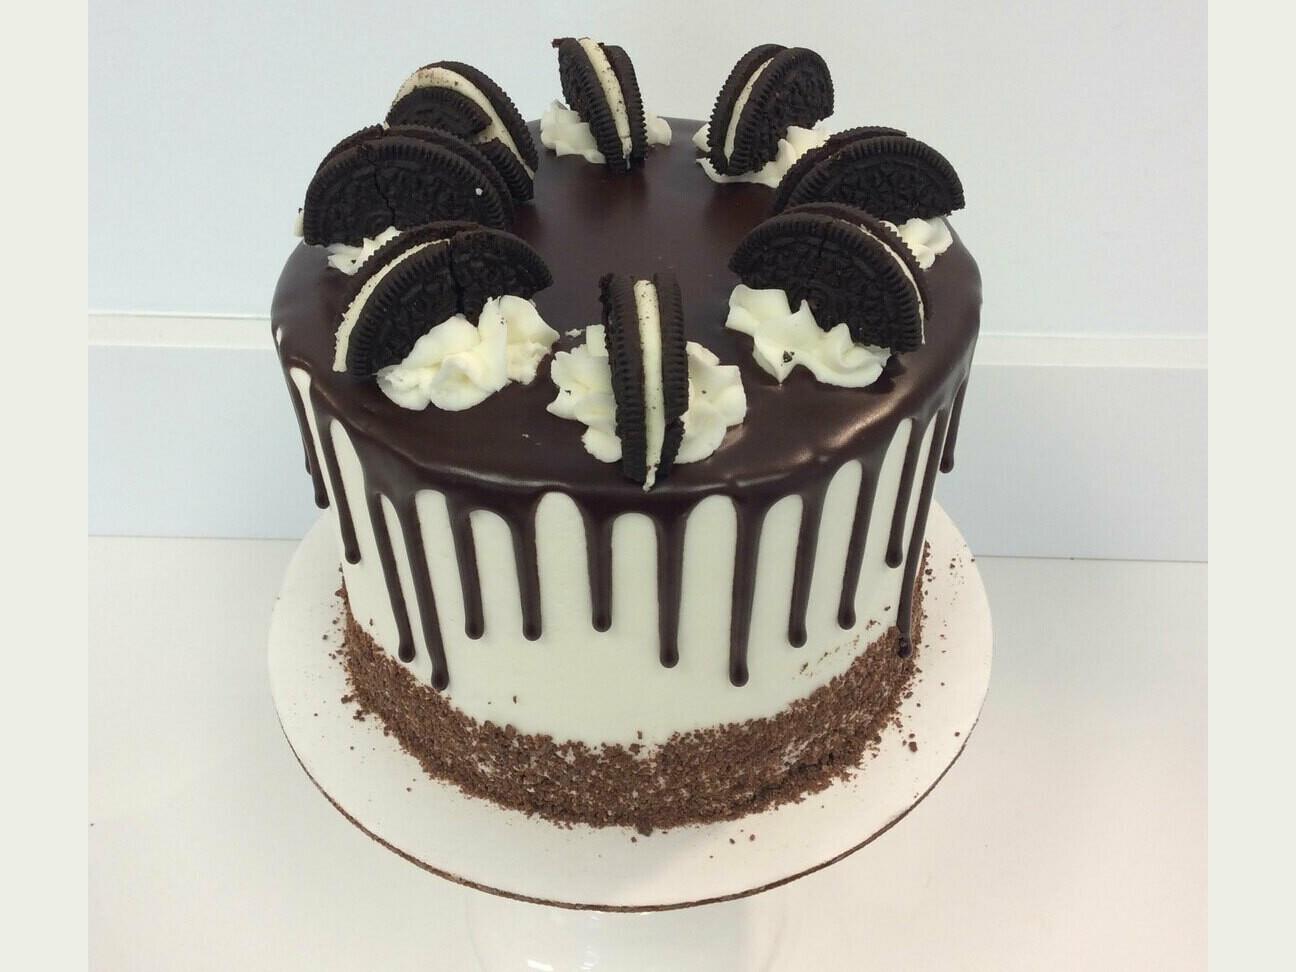 Vanilla Oreo Drip Cake